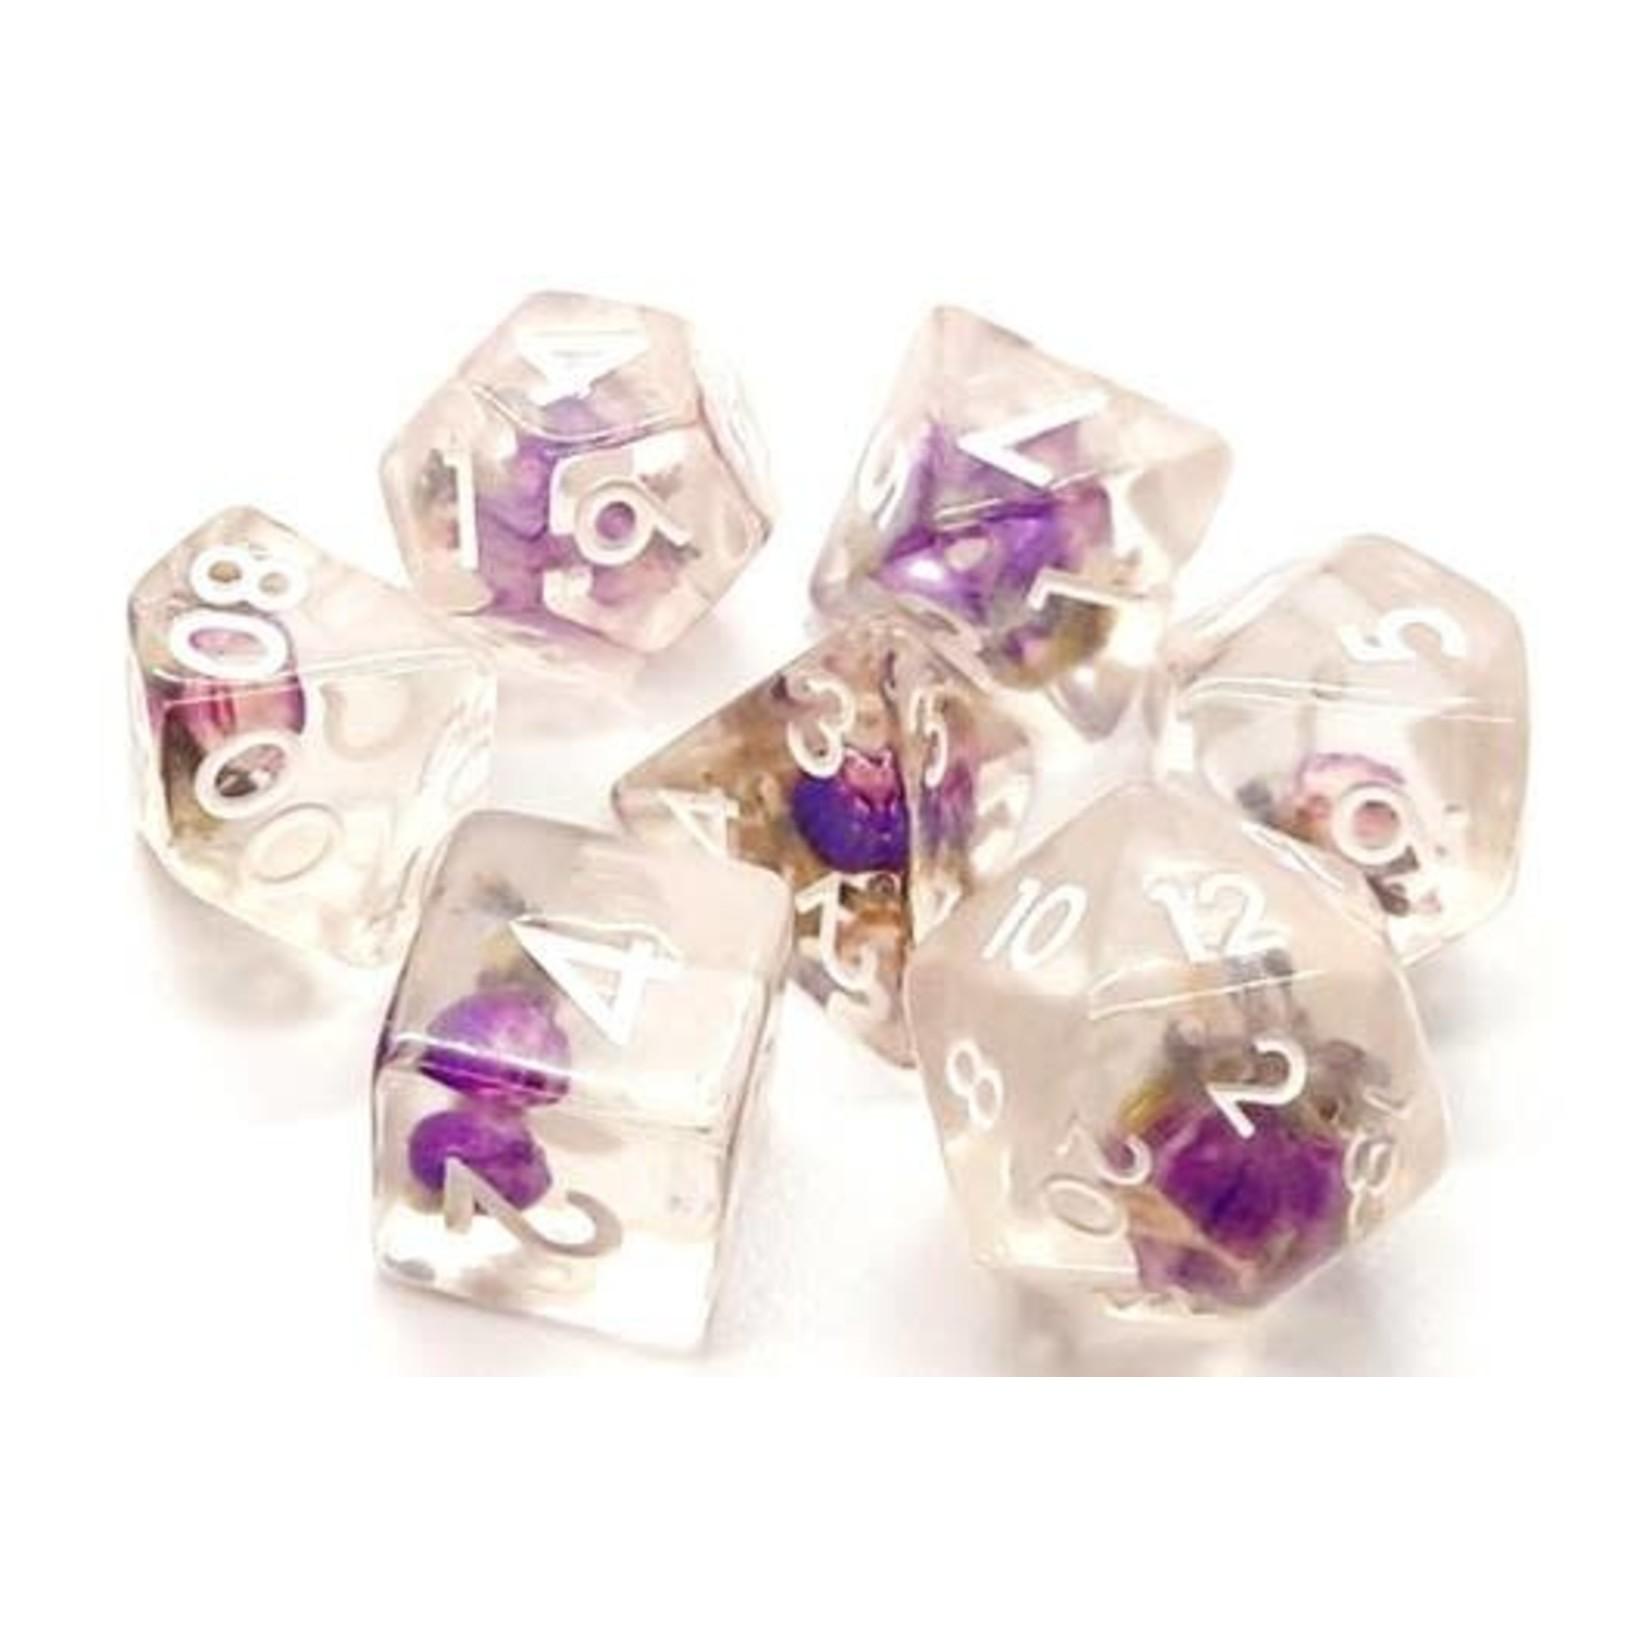 Old School 7 Piece Dice Set: Infused - Purple Flower